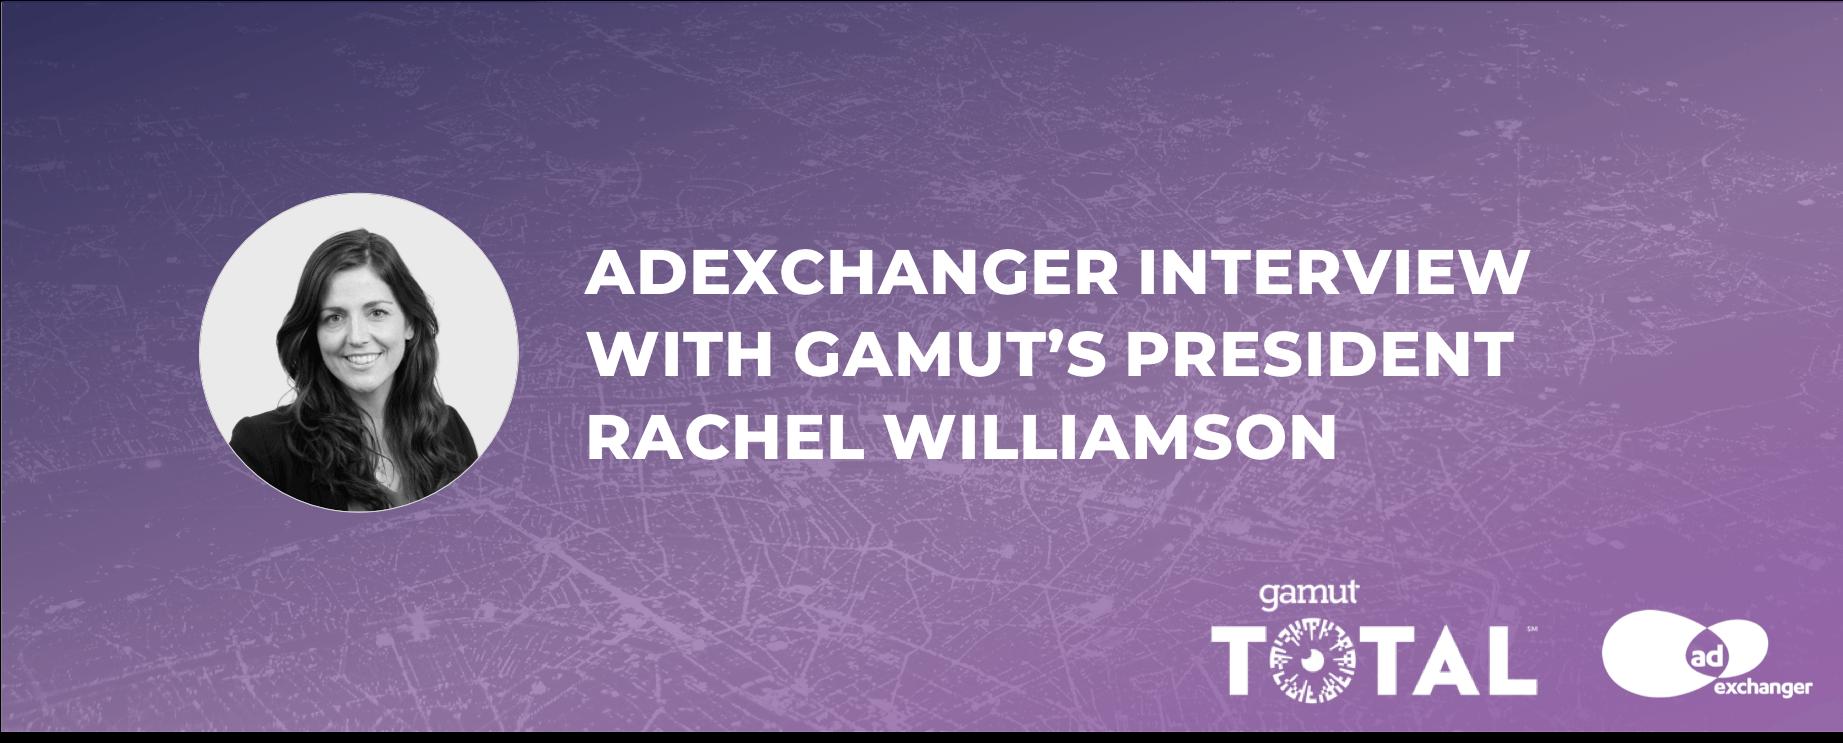 Gamut_AdExchanger_Rachel-Williamson-interview